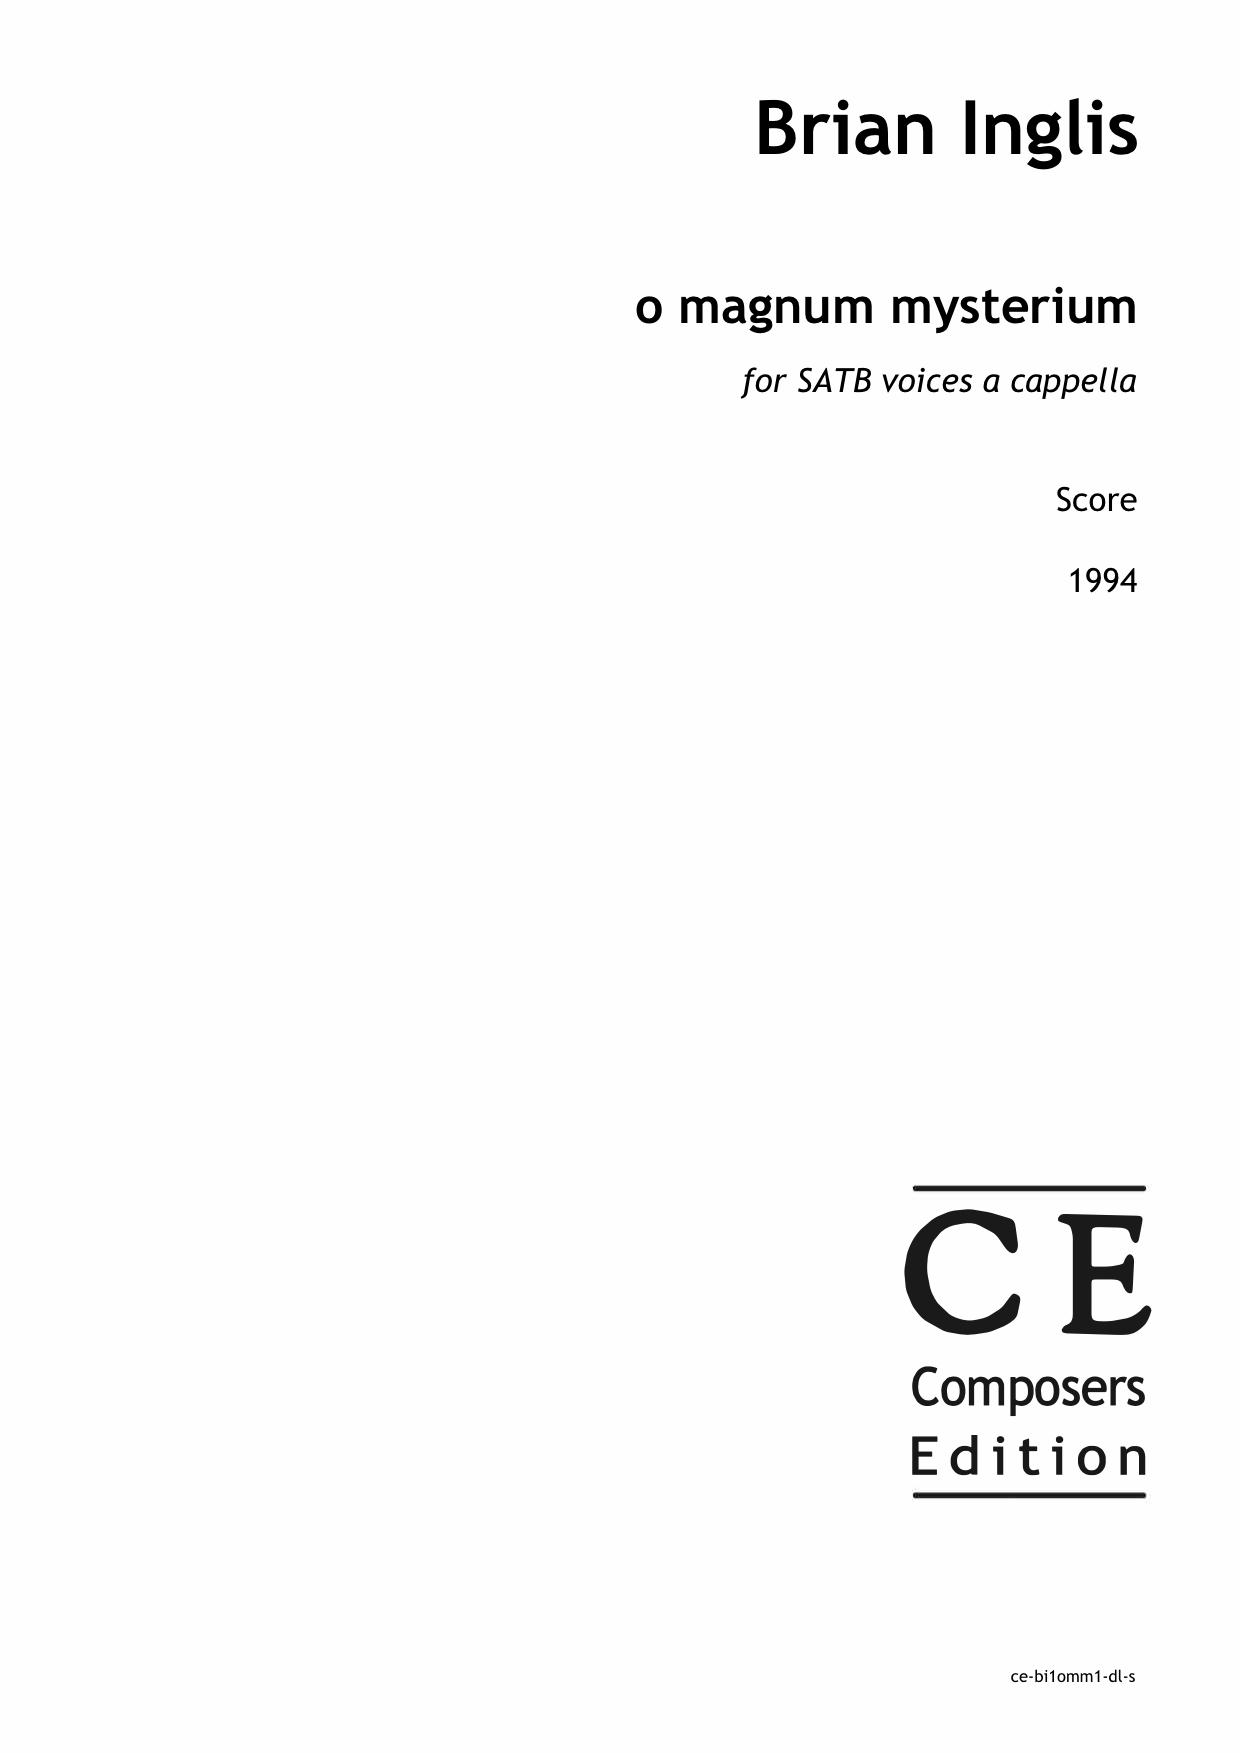 Brian Inglis: o magnum mysterium (SATB version) for SATB voices a cappella